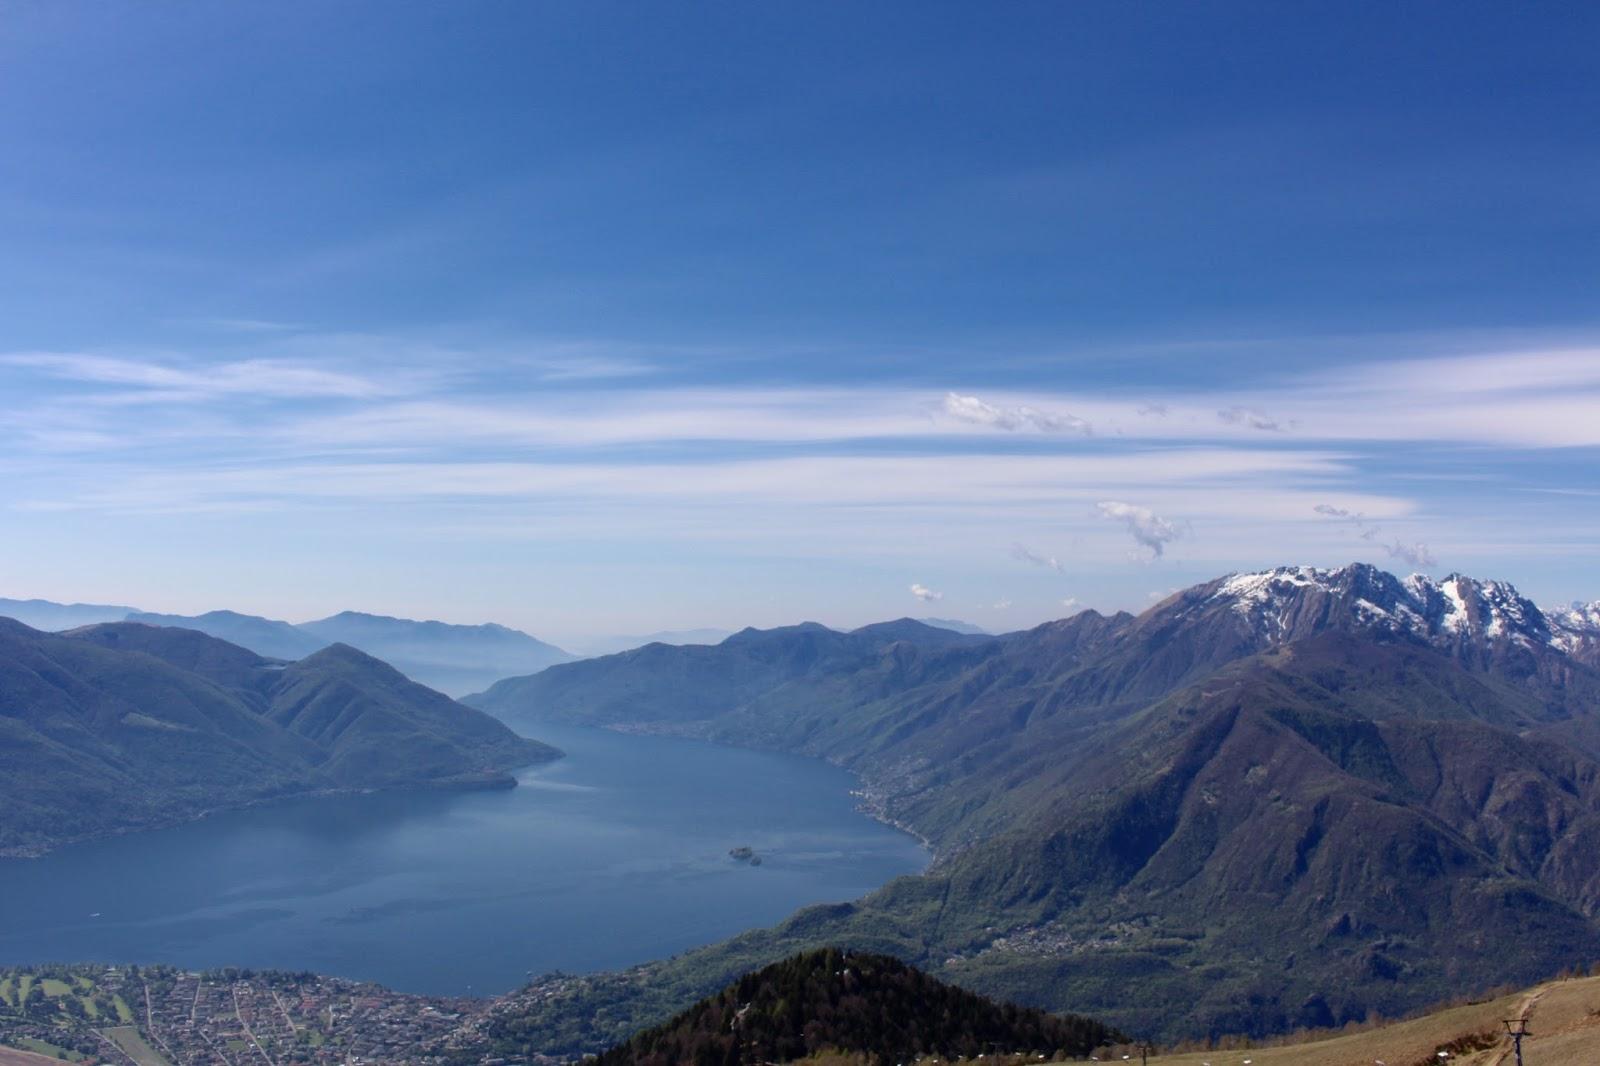 Ausblick von Cimetta auf den Lago Maggiore, Tessin